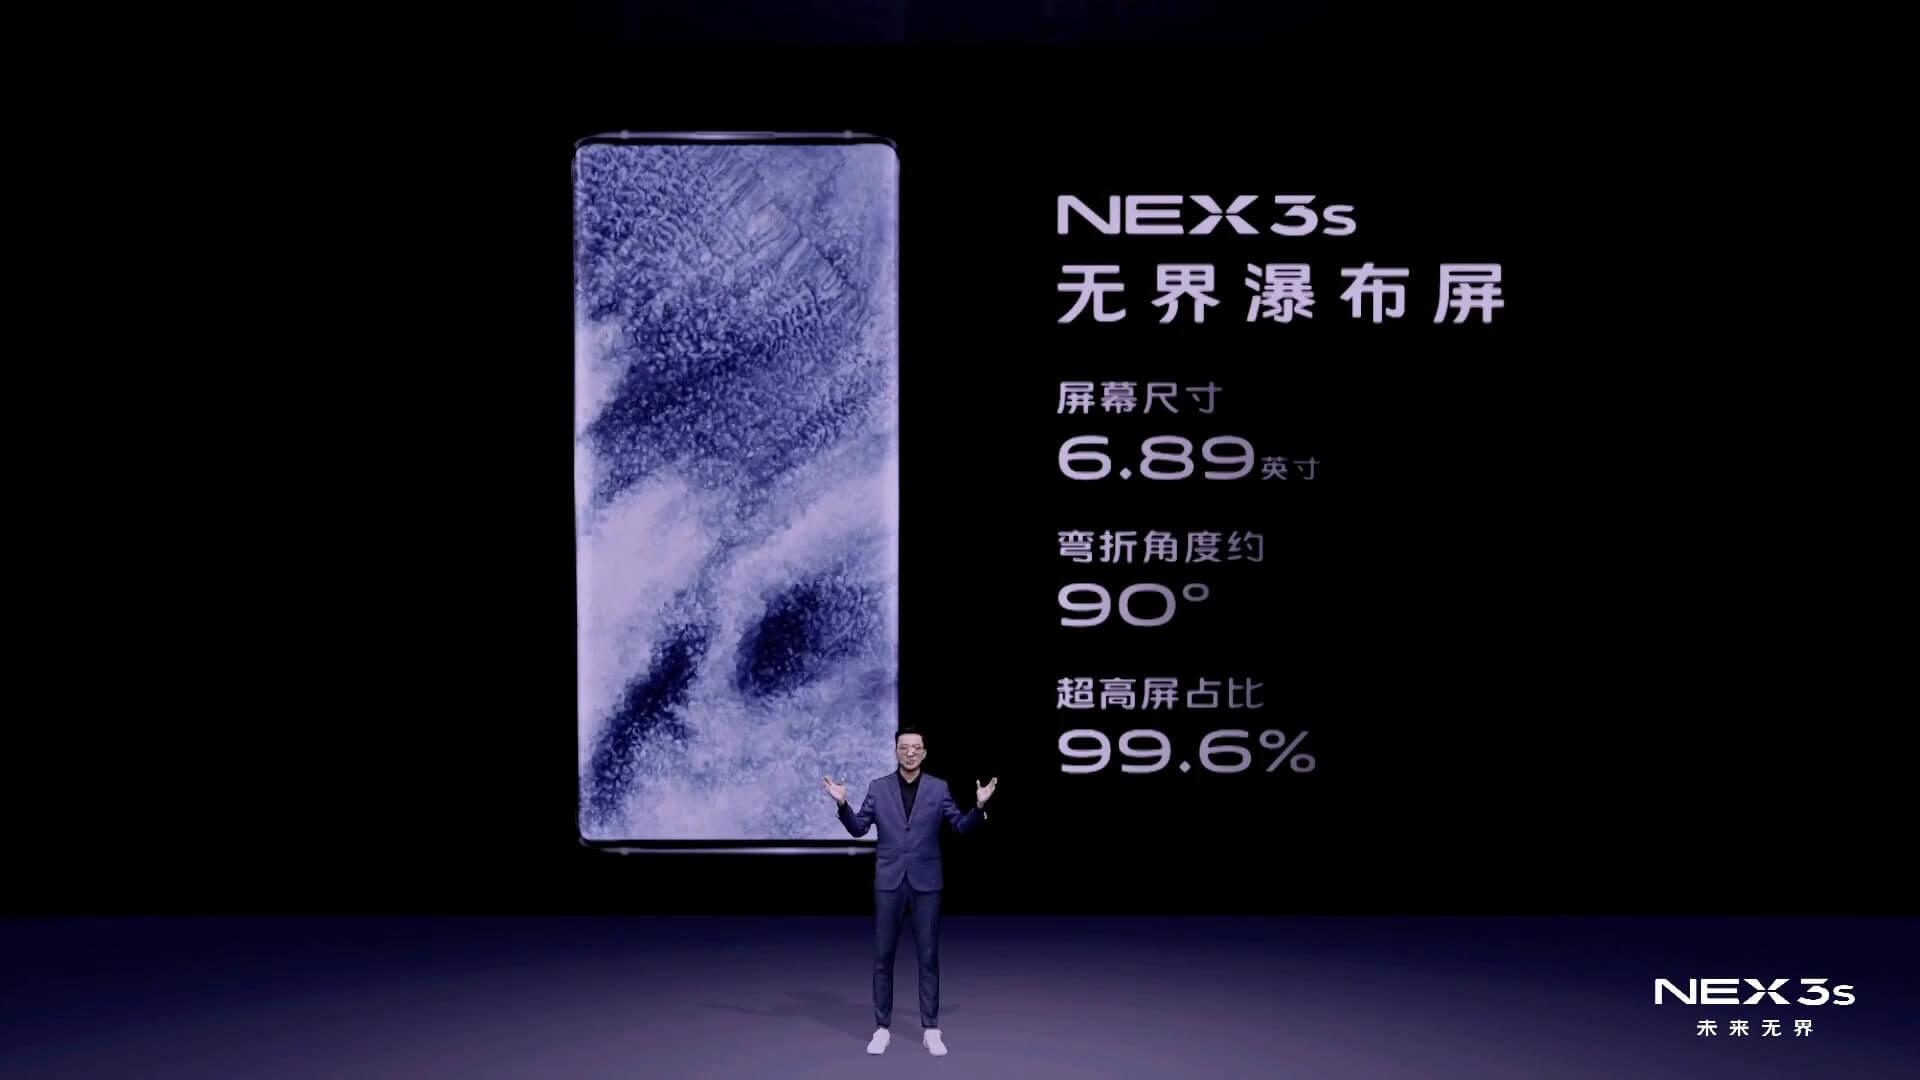 Vivo nex 3s 5g appearance